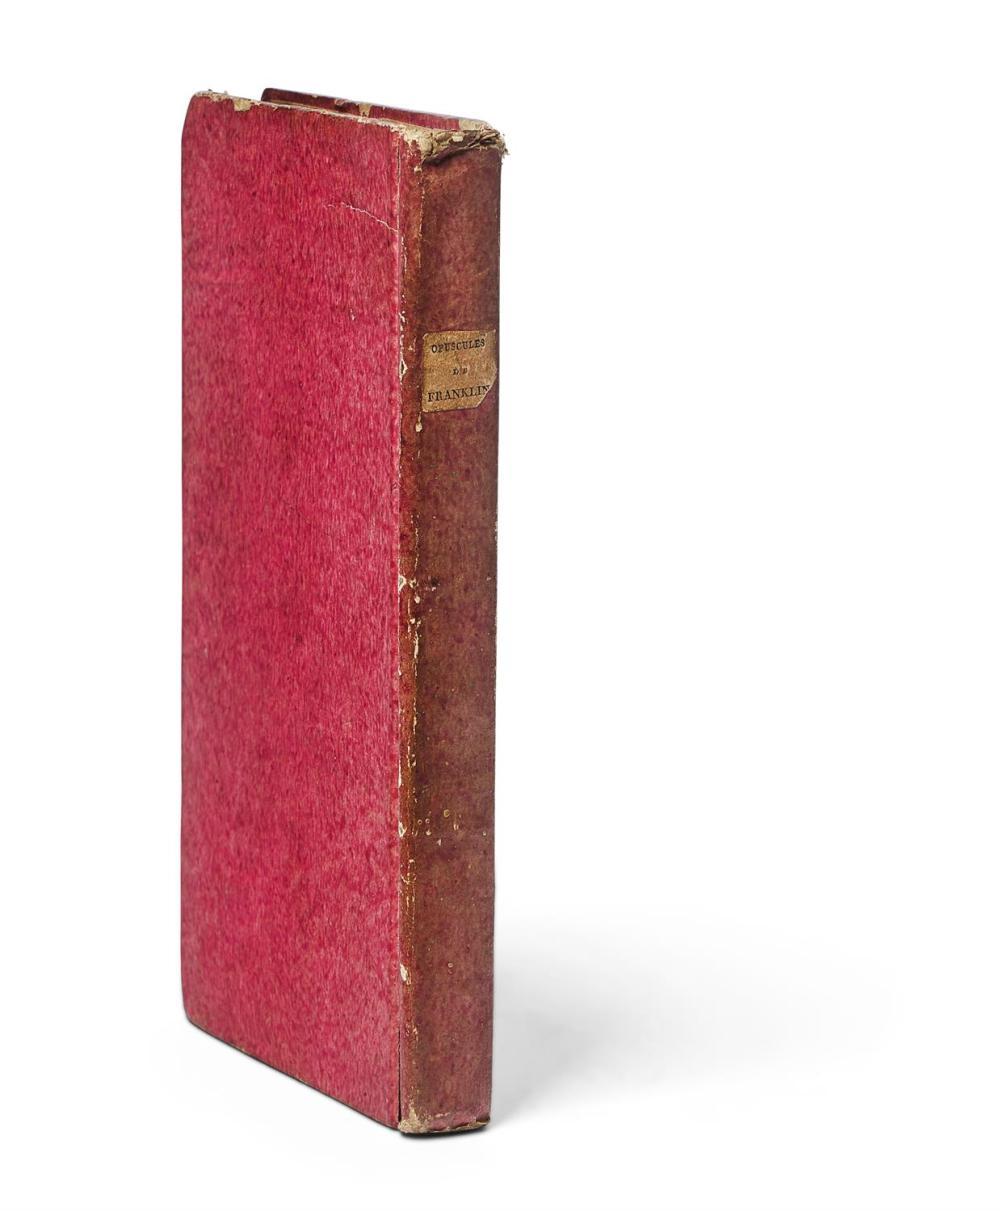 Ɵ FRANKLIN, BENJAMIN. THE WAY TO WEALTH. PARIS. PRINTED FOR RENOUARD, 1795